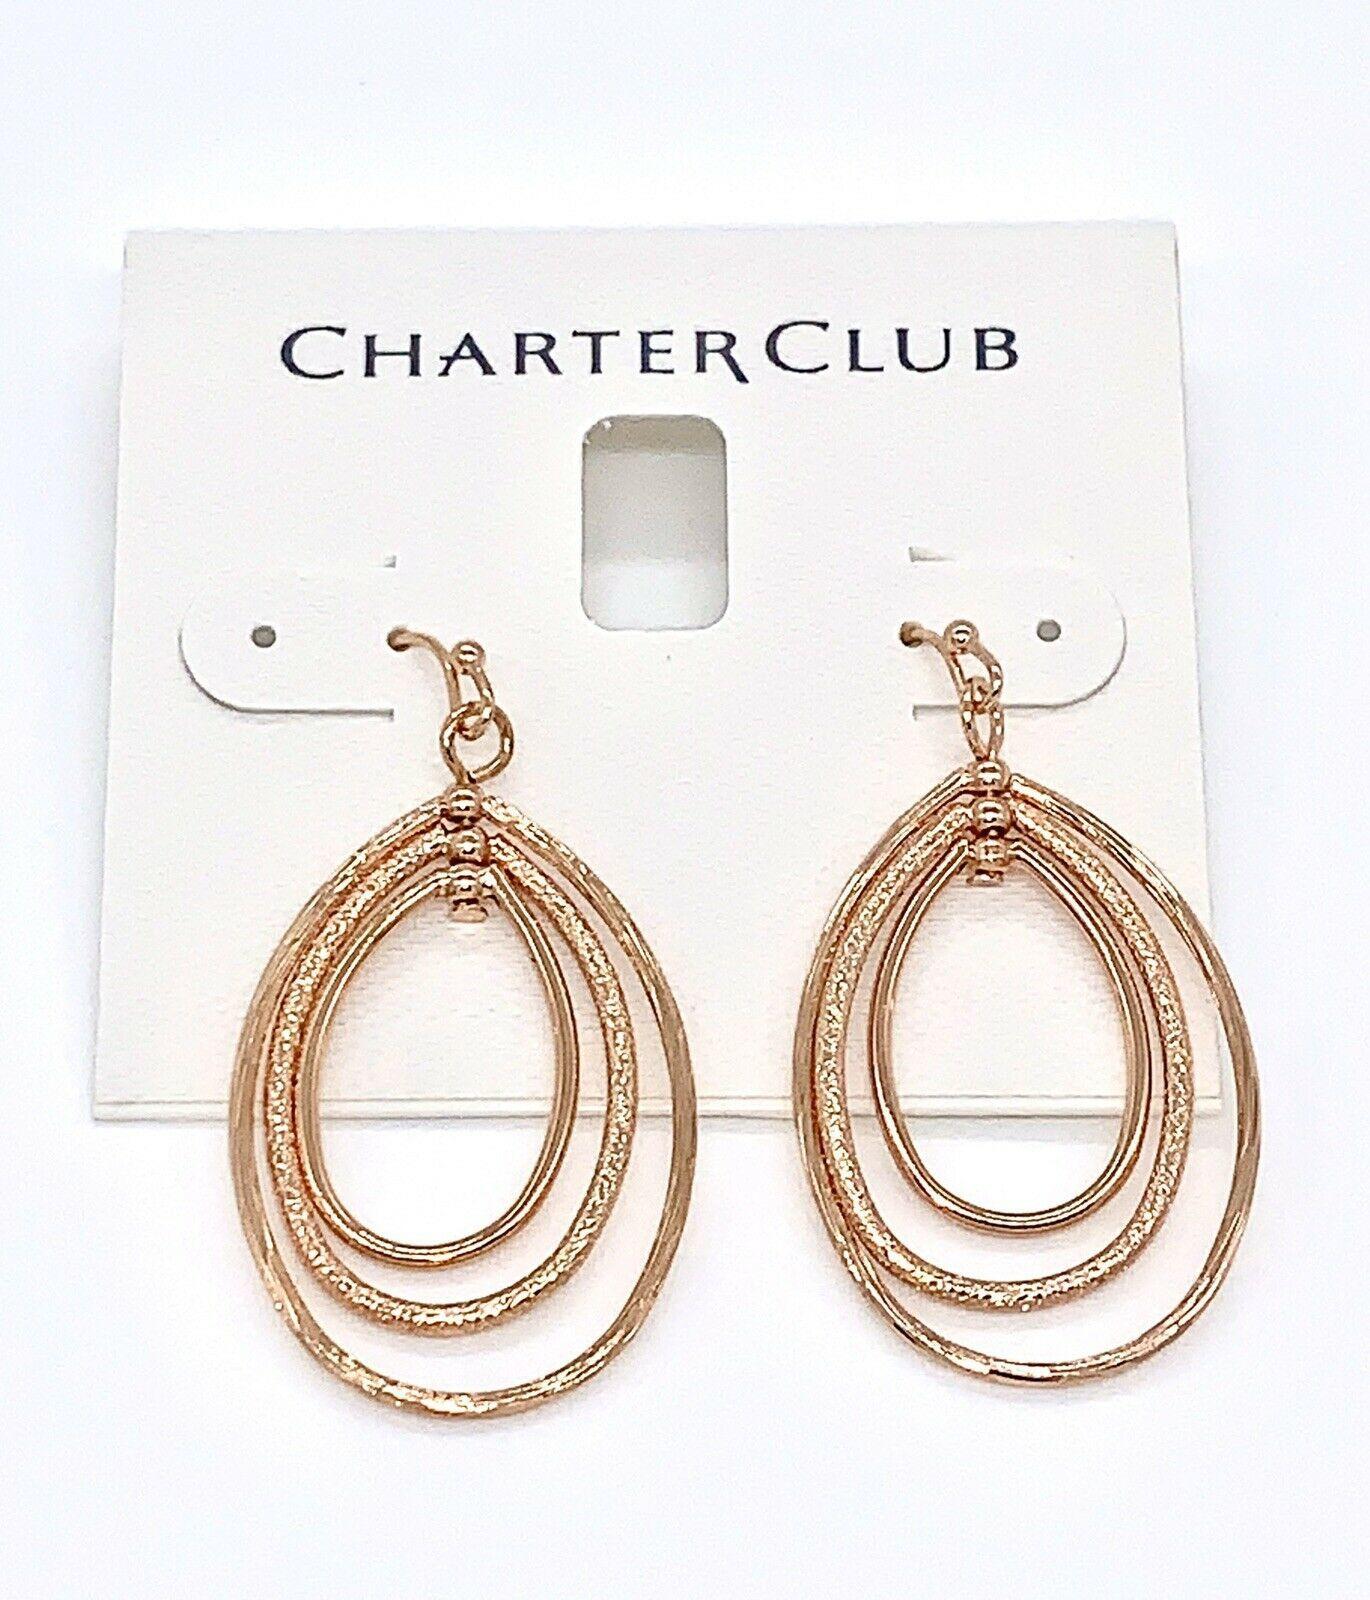 Charter Club Gold-Tone  Drop Hoop Earrings - $12.00